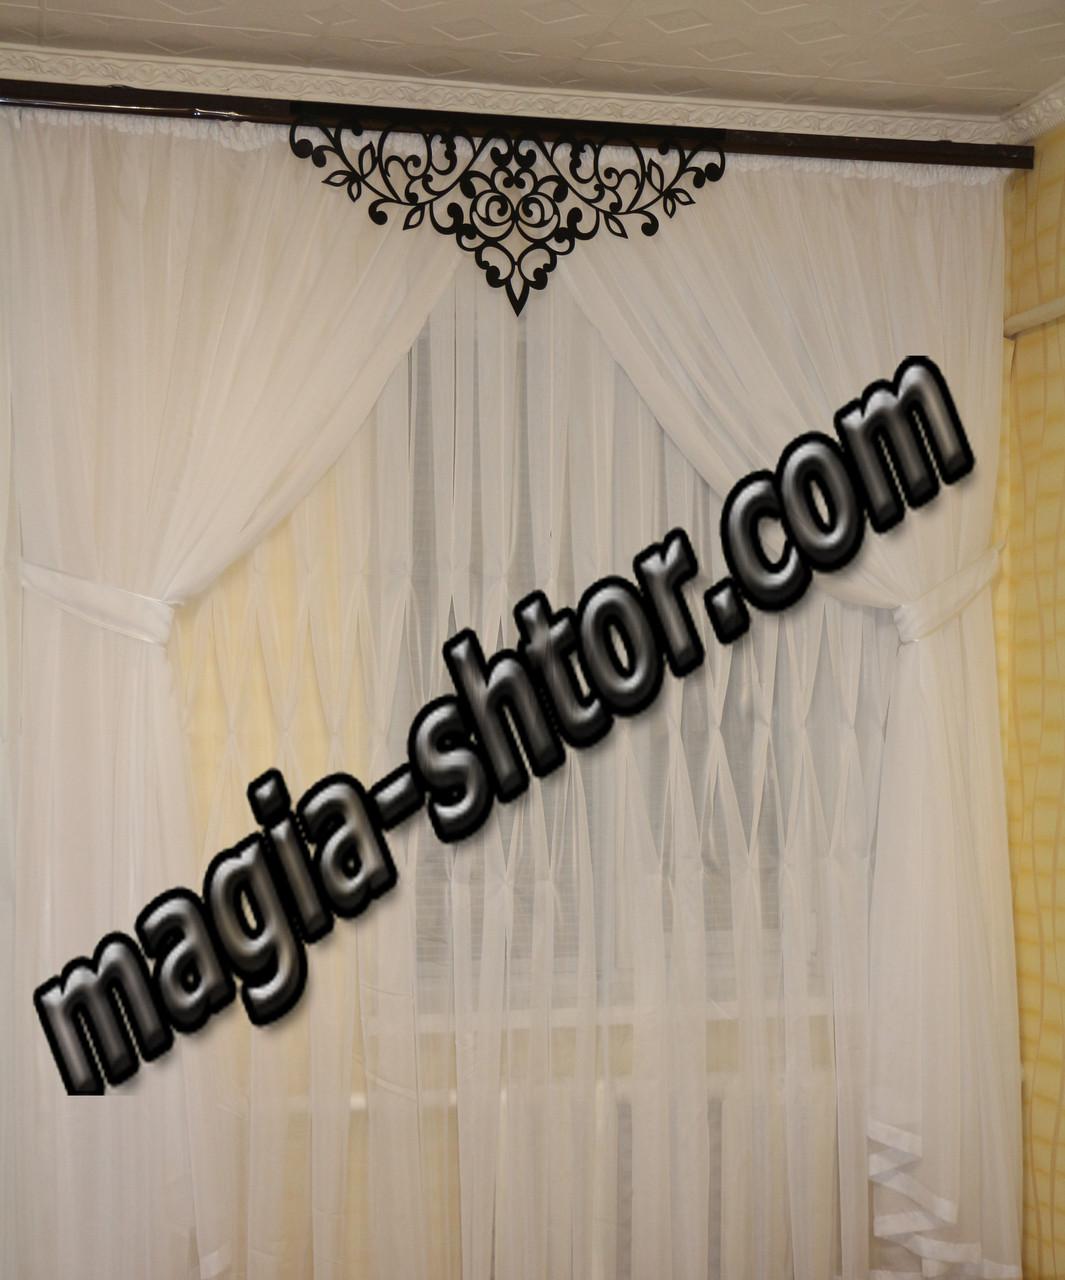 Комплект: ажурный ламбрекен + шторы + тюль